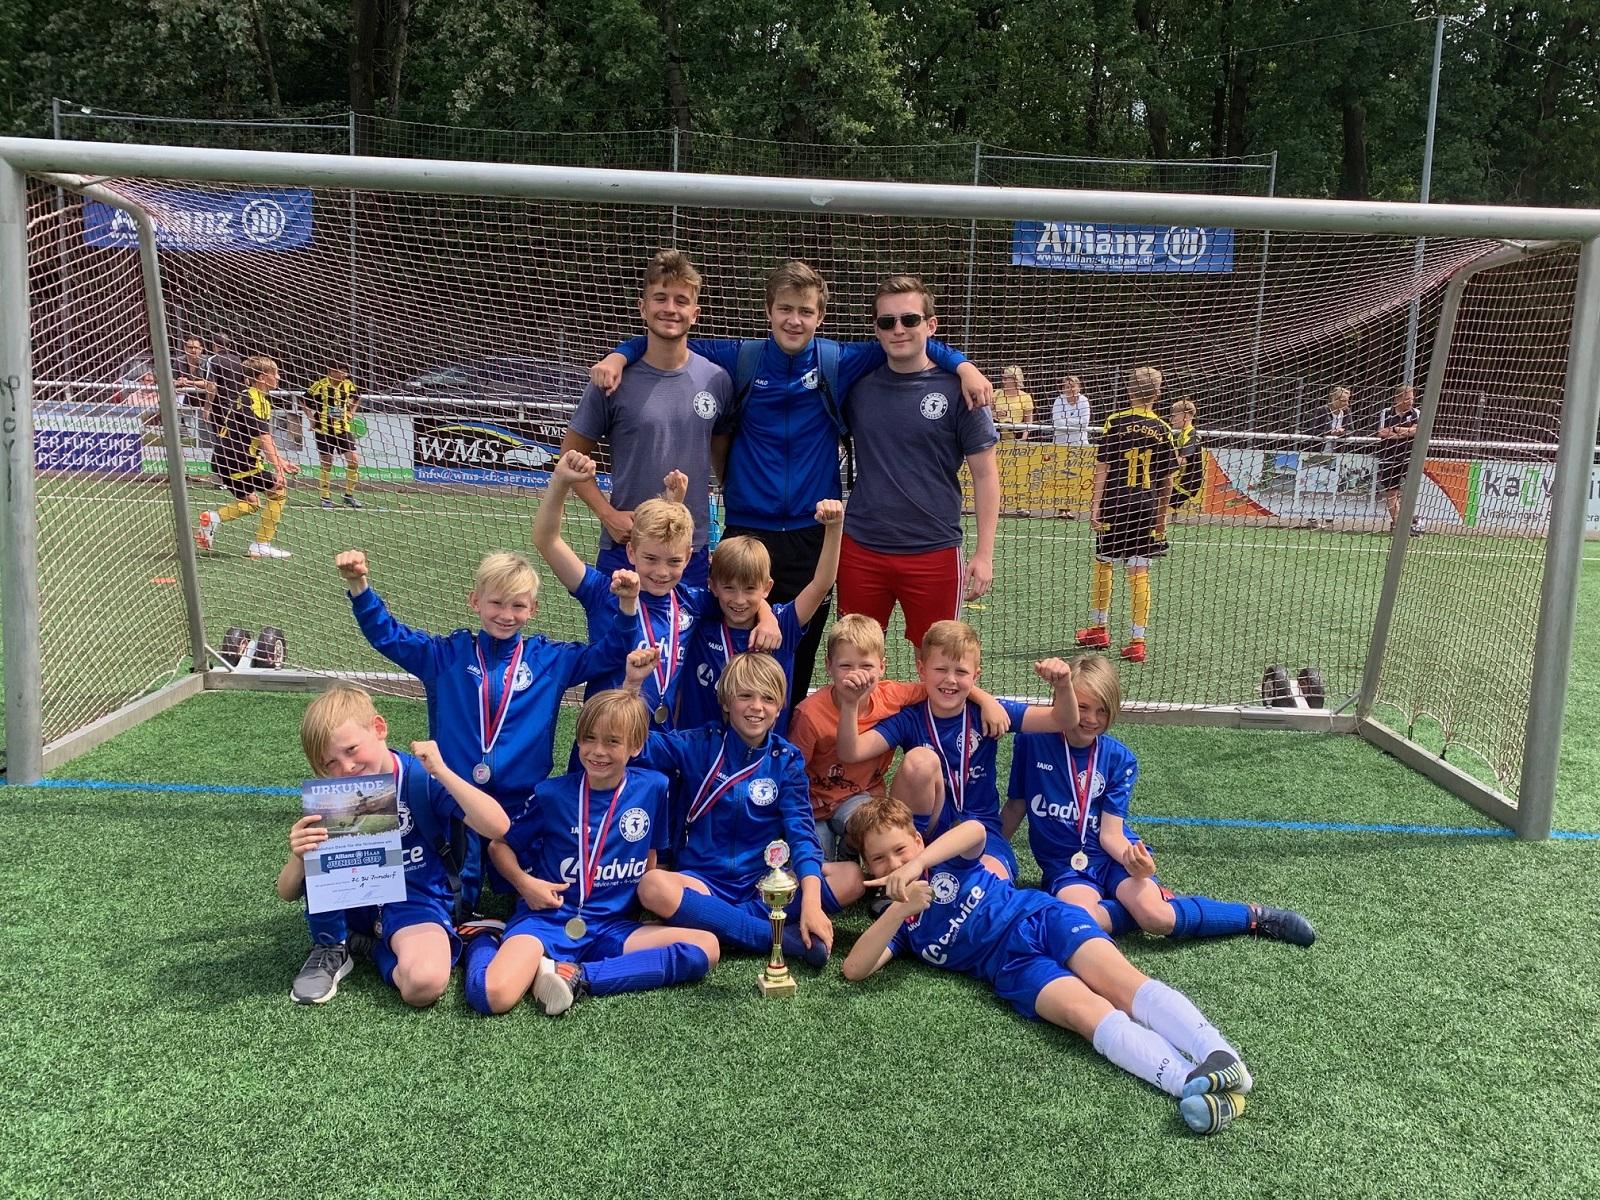 Turniersieg der U09 in Marienfeld